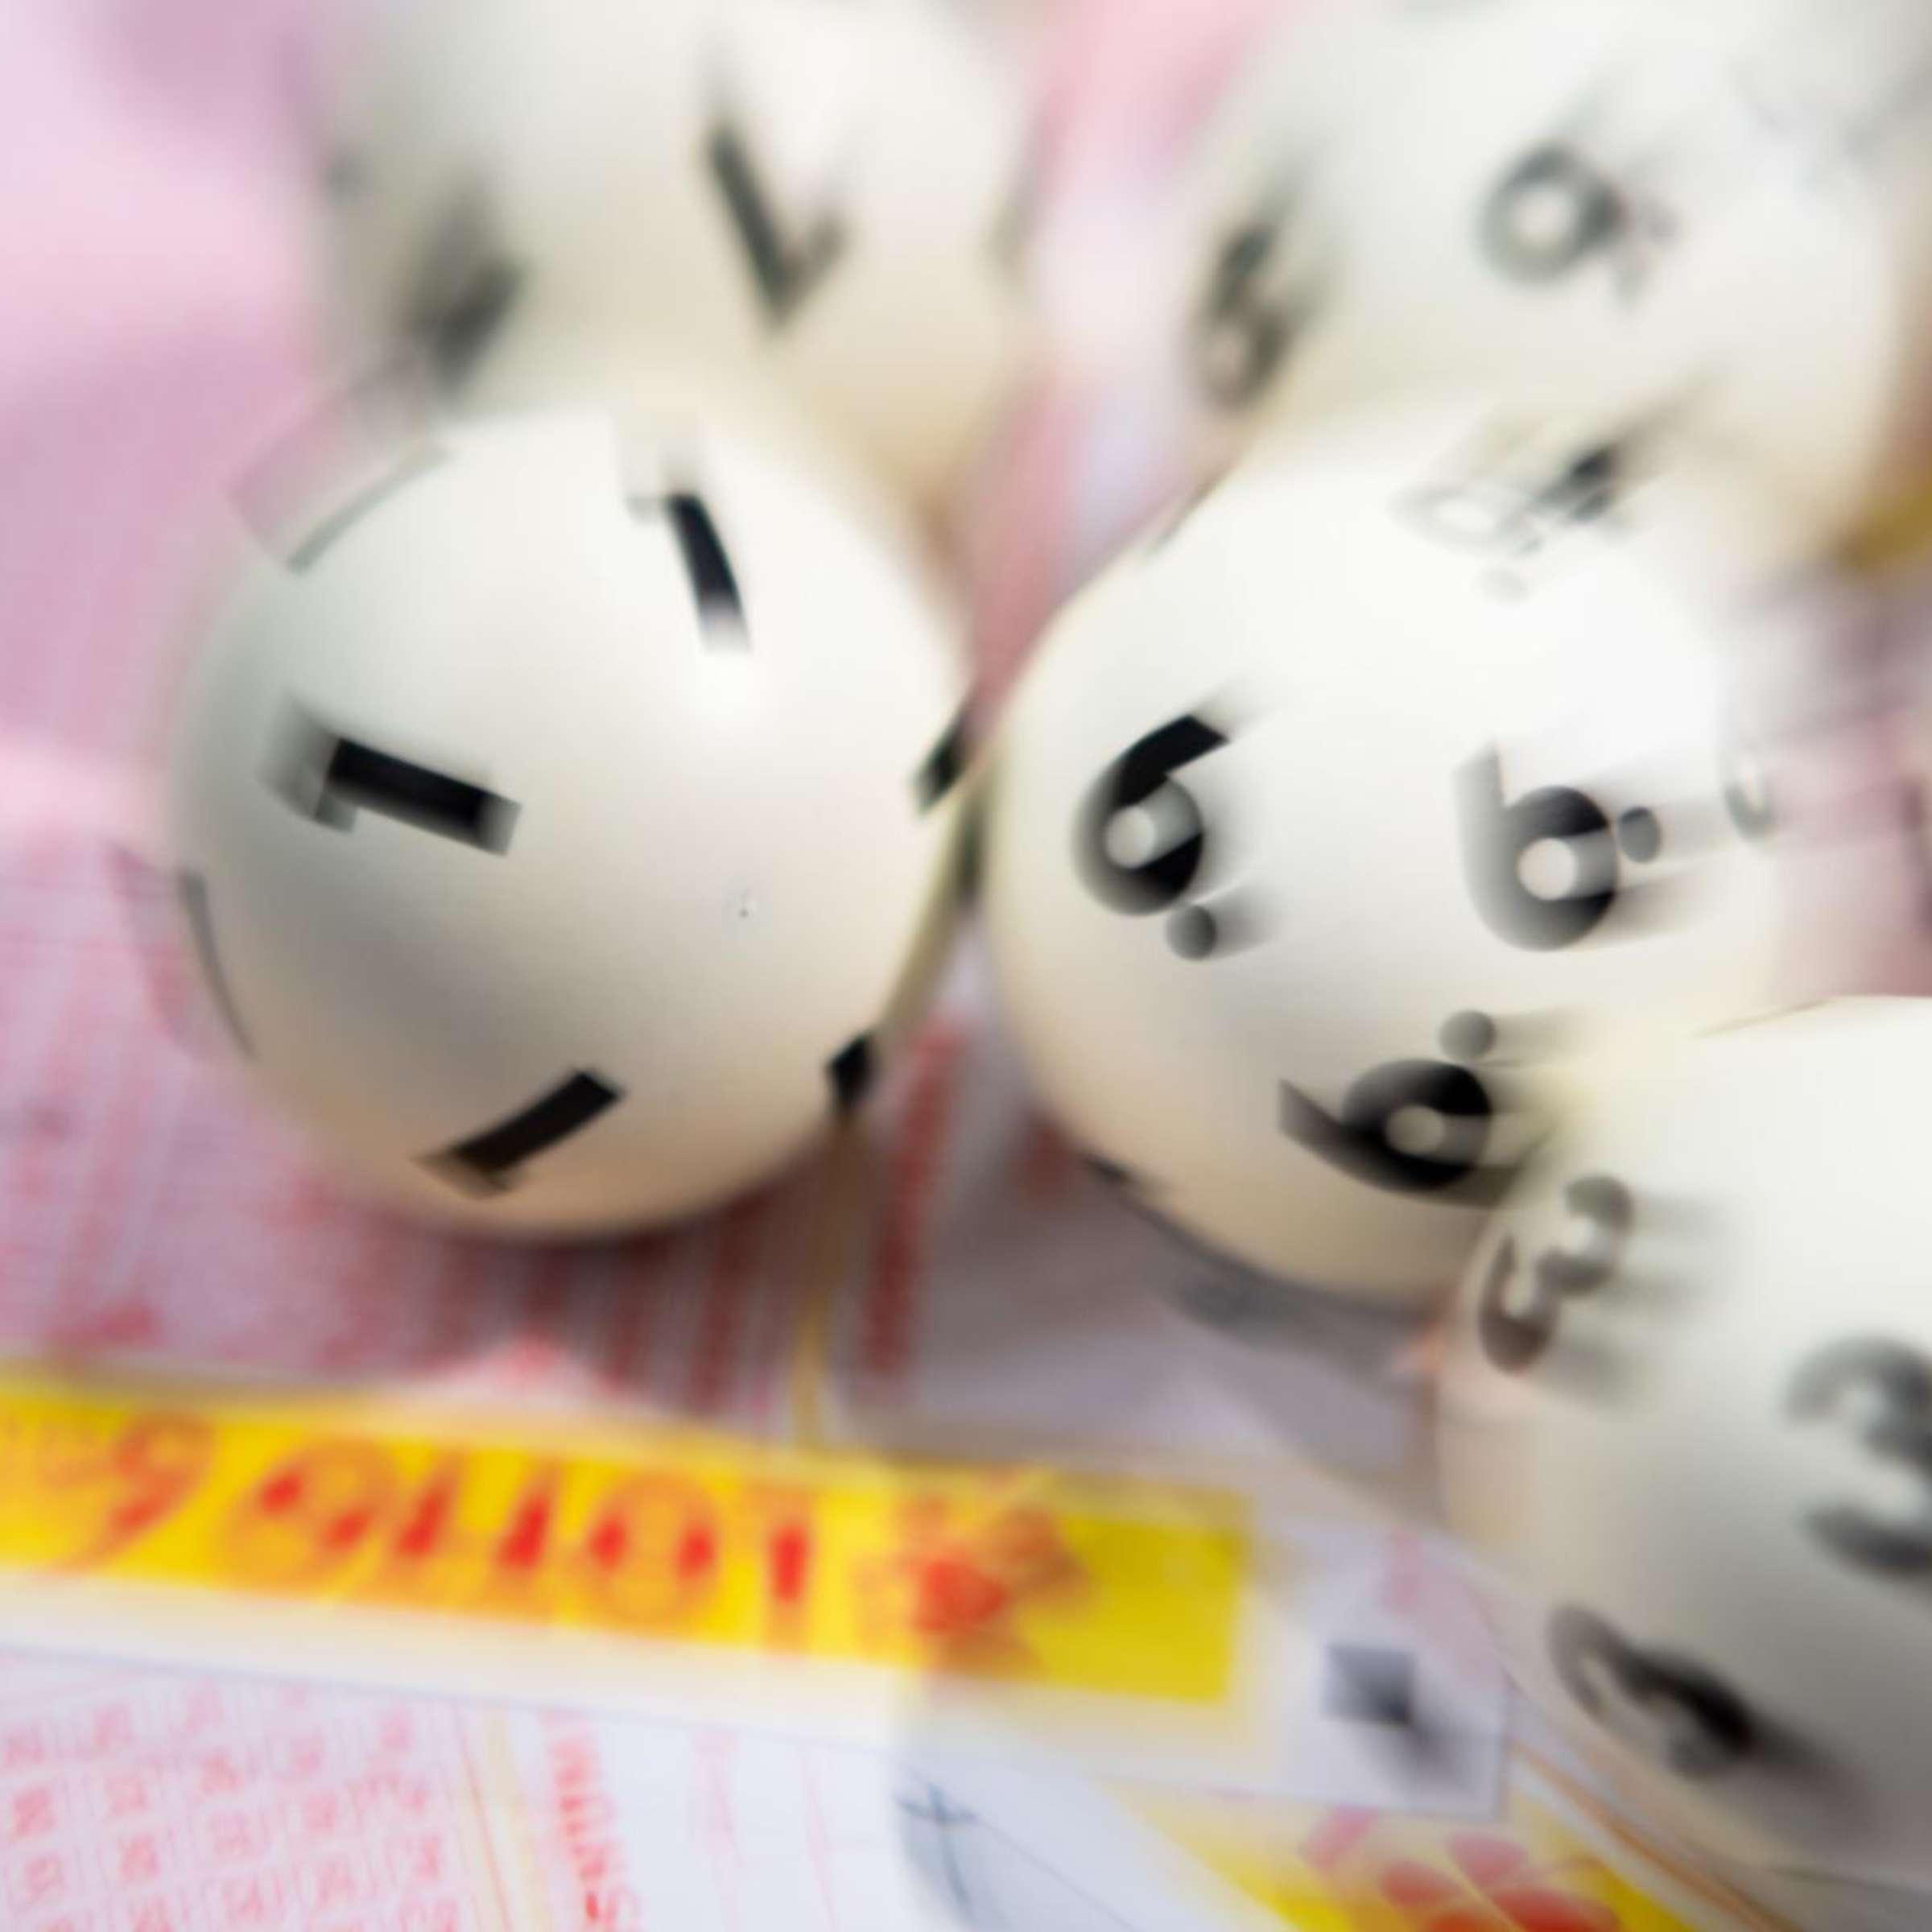 lotto jackpot nrw